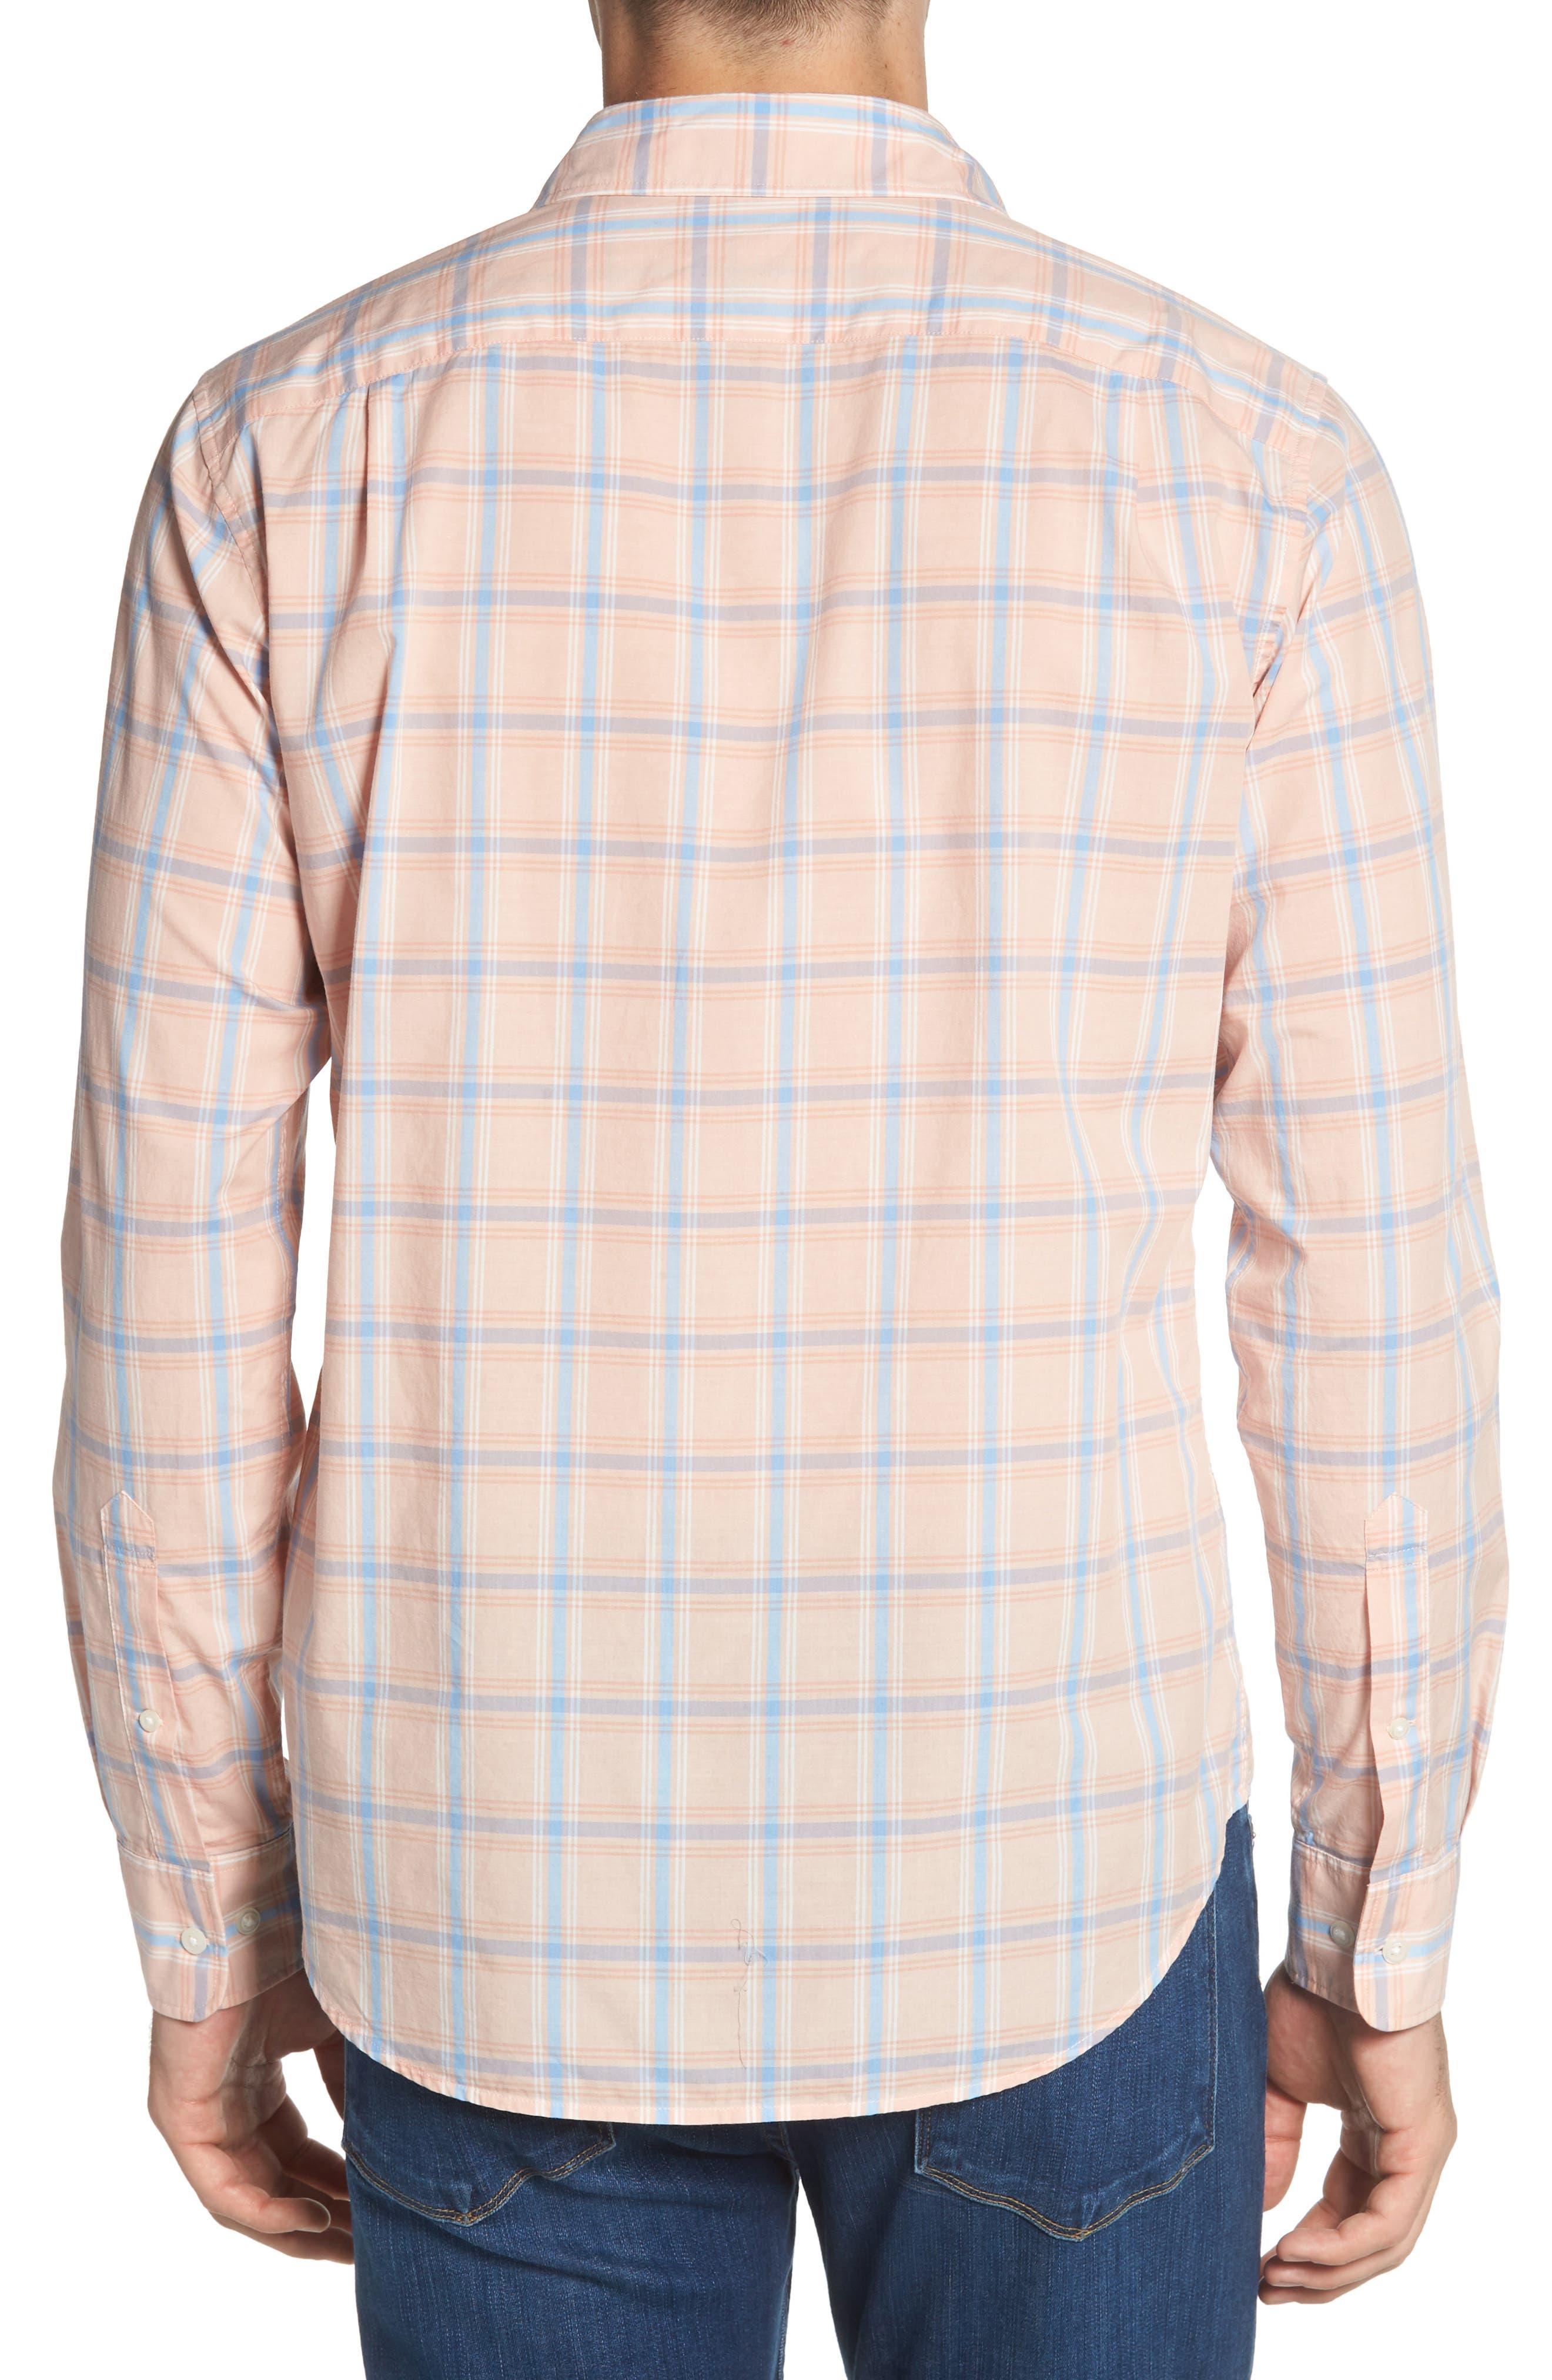 Summerweight Slim Fit Plaid Sport Shirt,                             Alternate thumbnail 4, color,                             Frida Peak Plaid - Sorbet